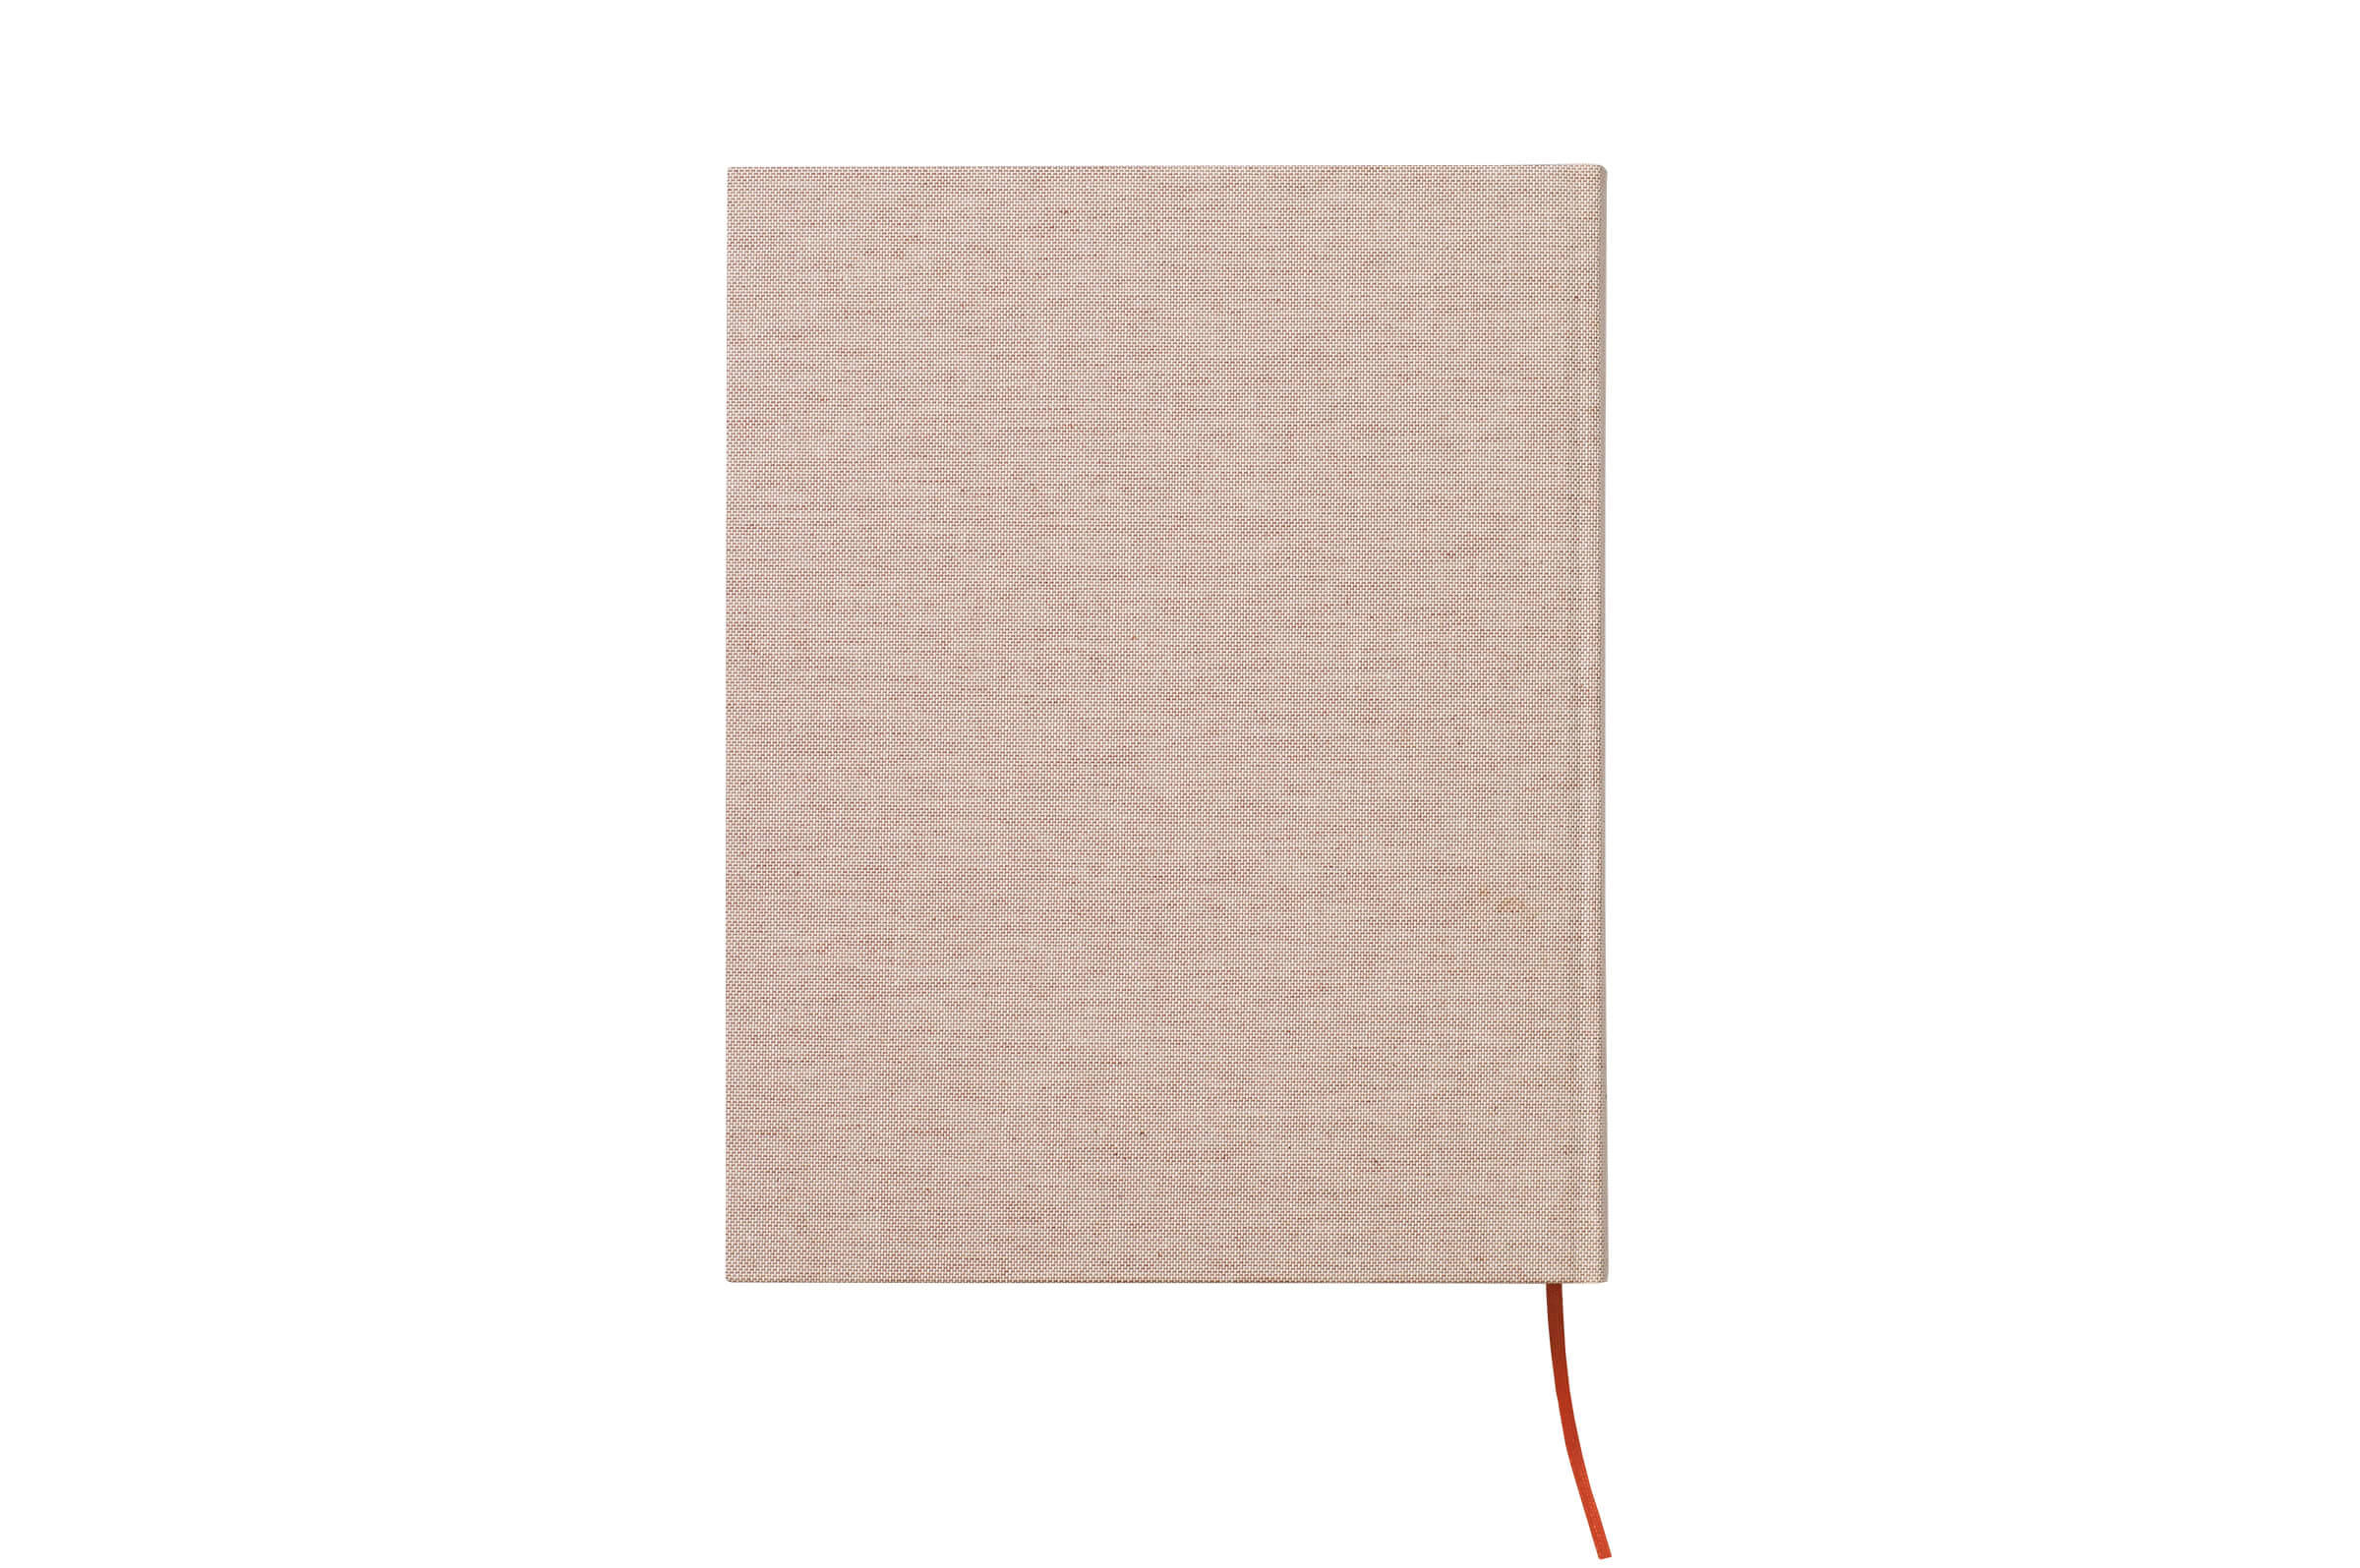 Product image of Rosetta